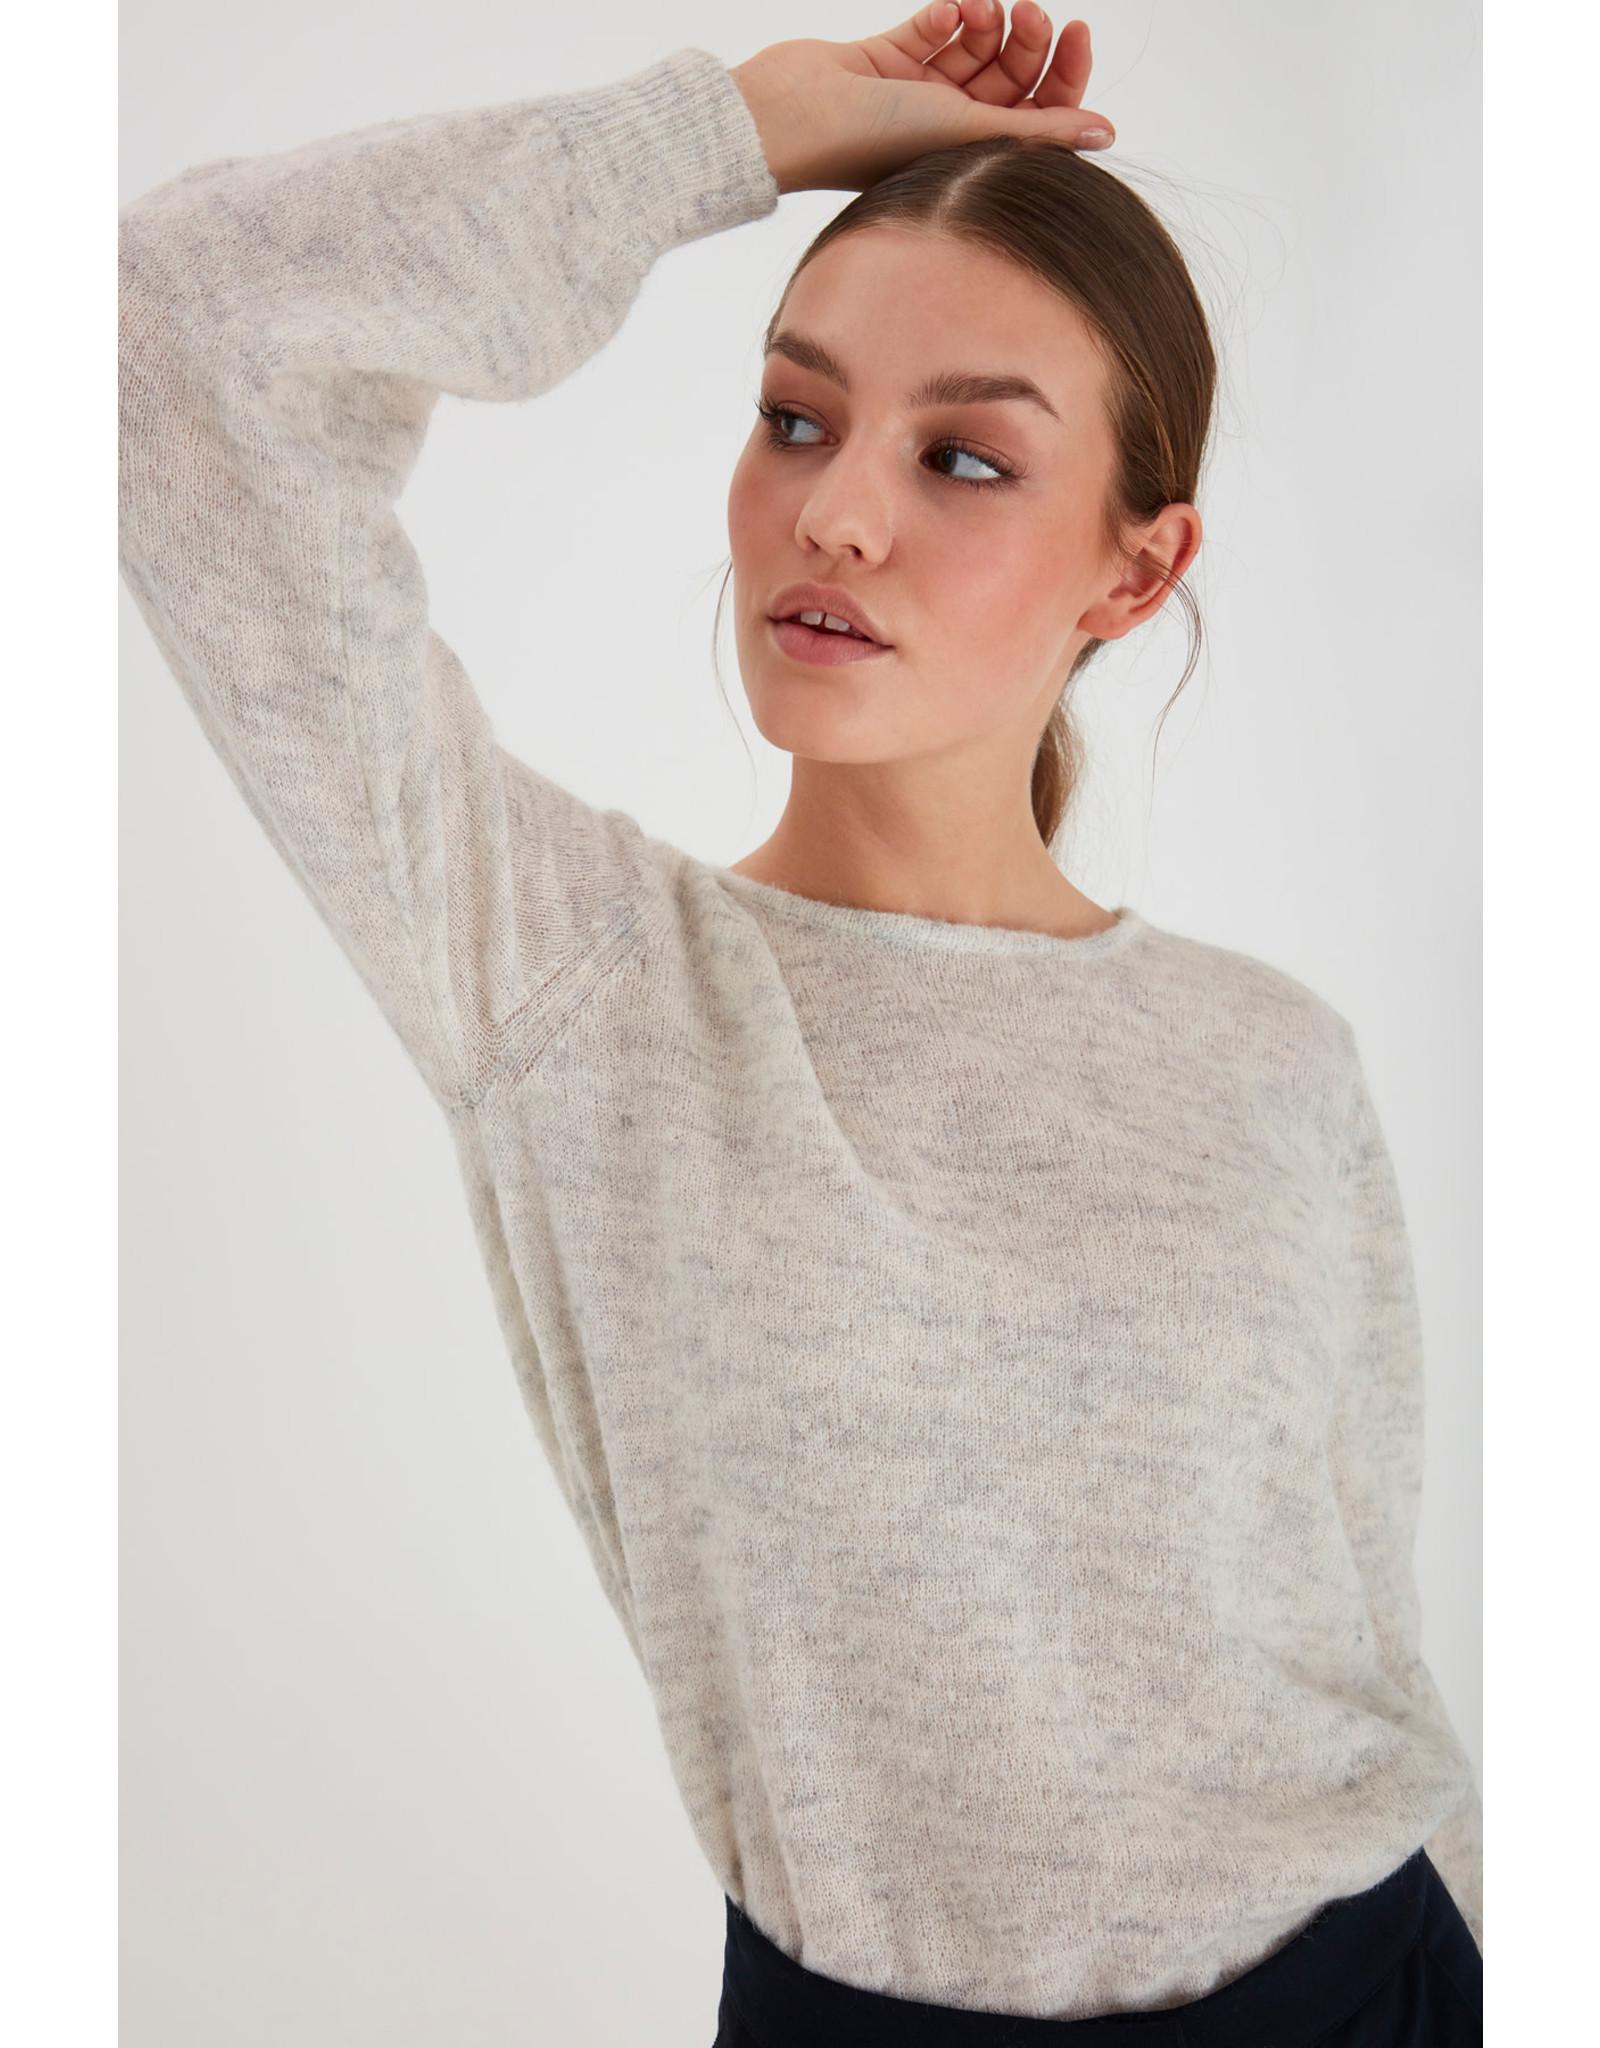 IDK - White Snow Sweater